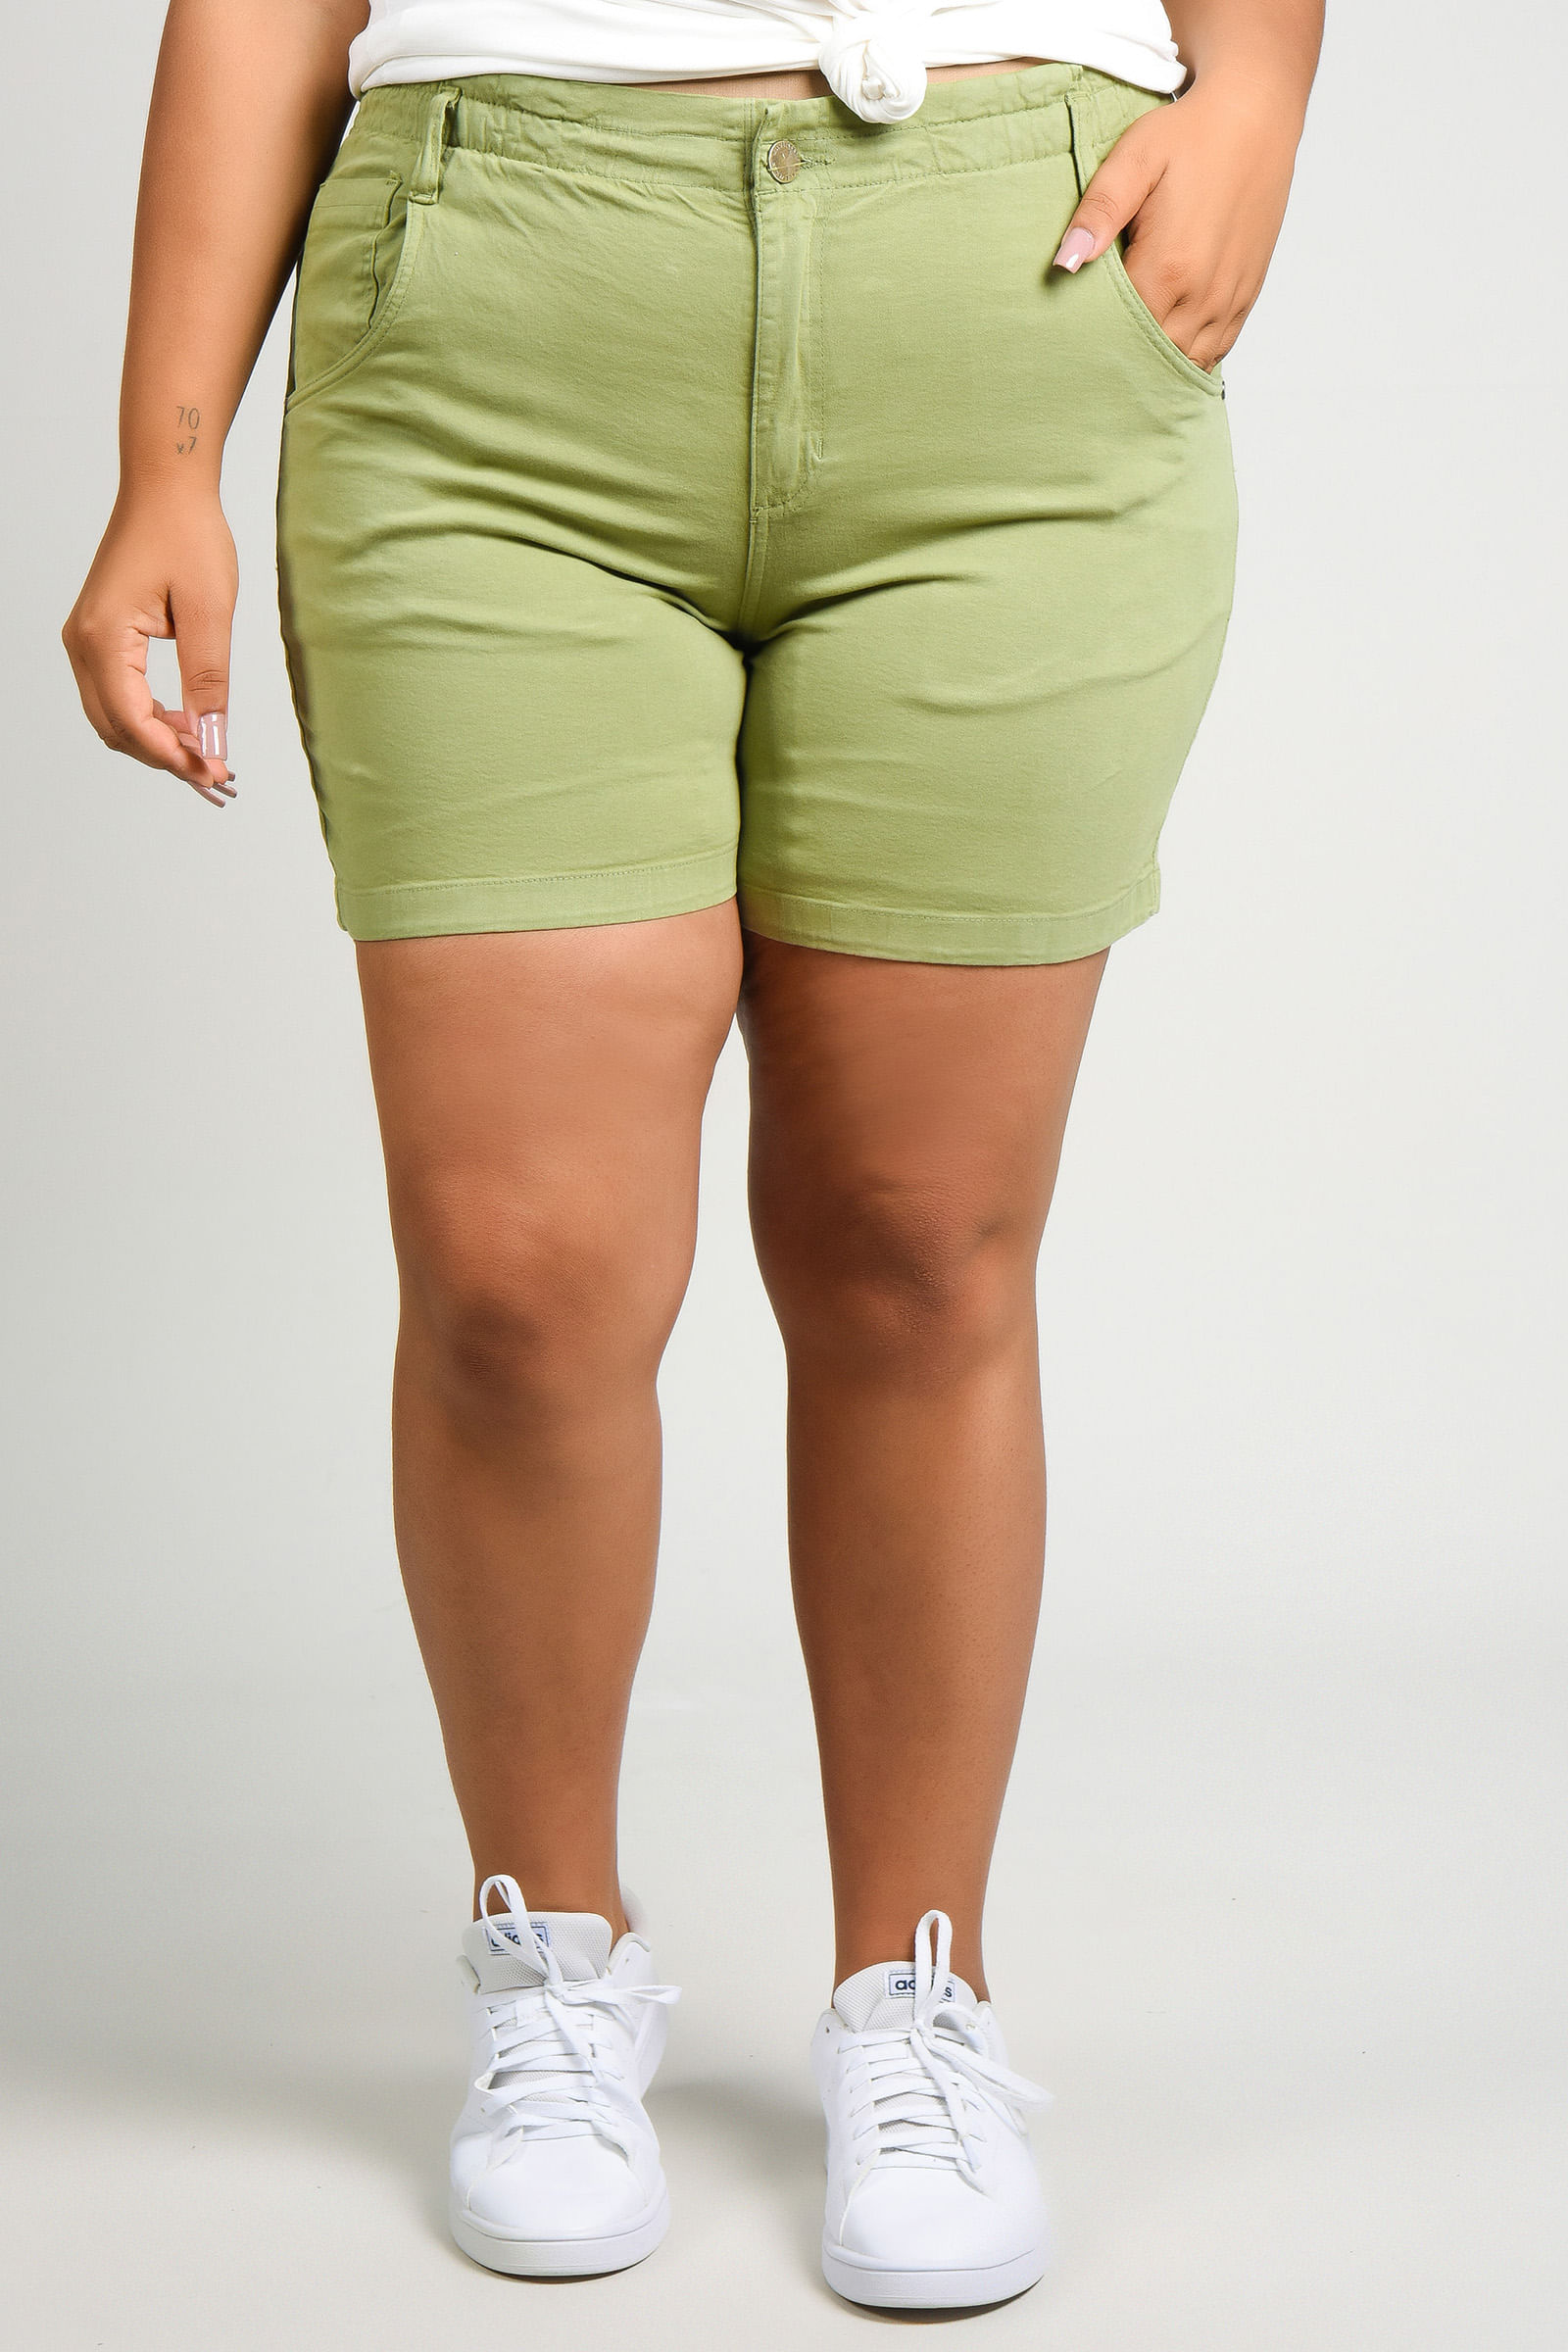 Shorts de sarja com elastano plus size verde